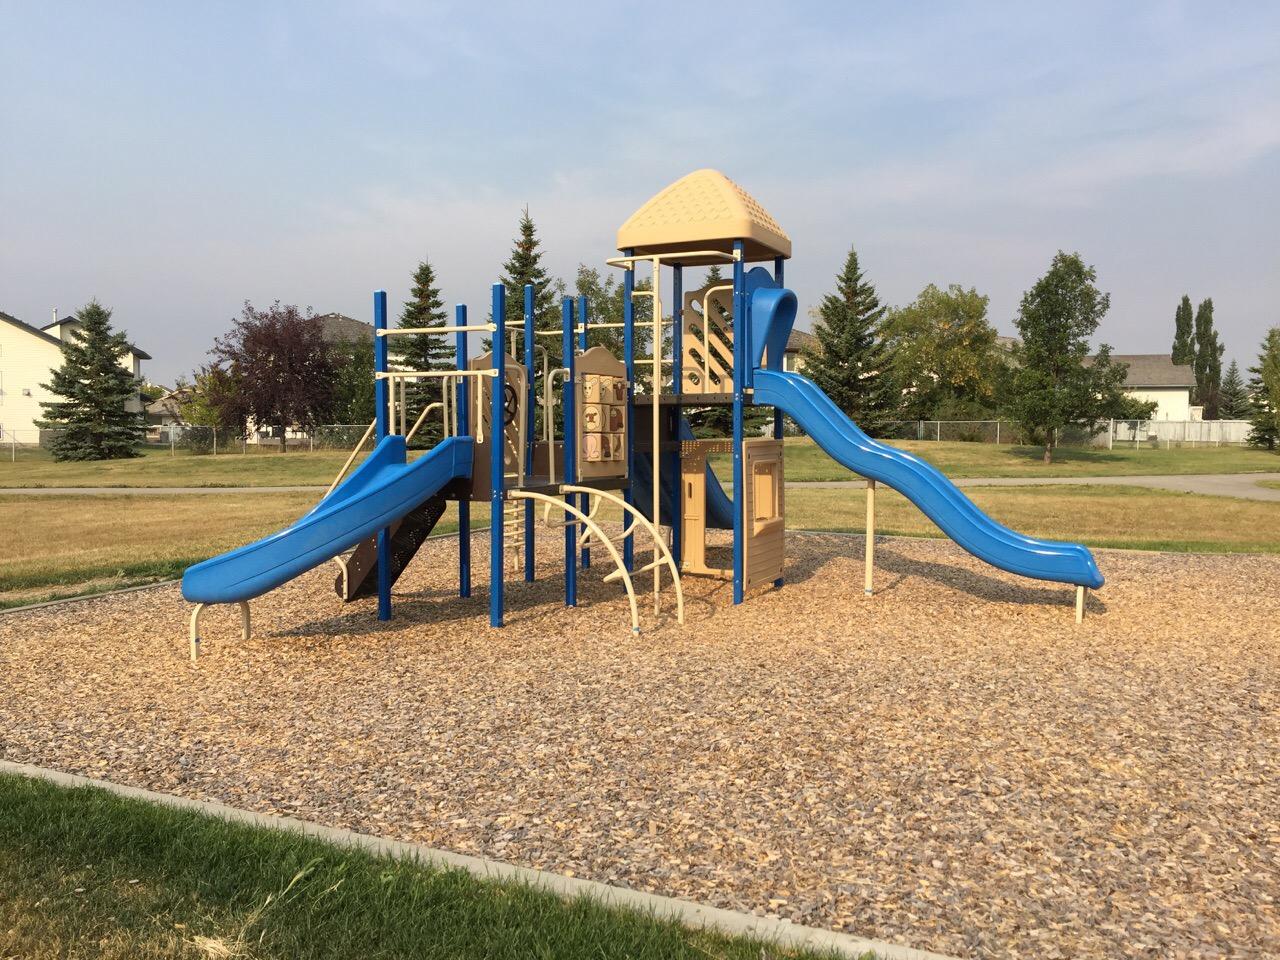 Chandelier Park